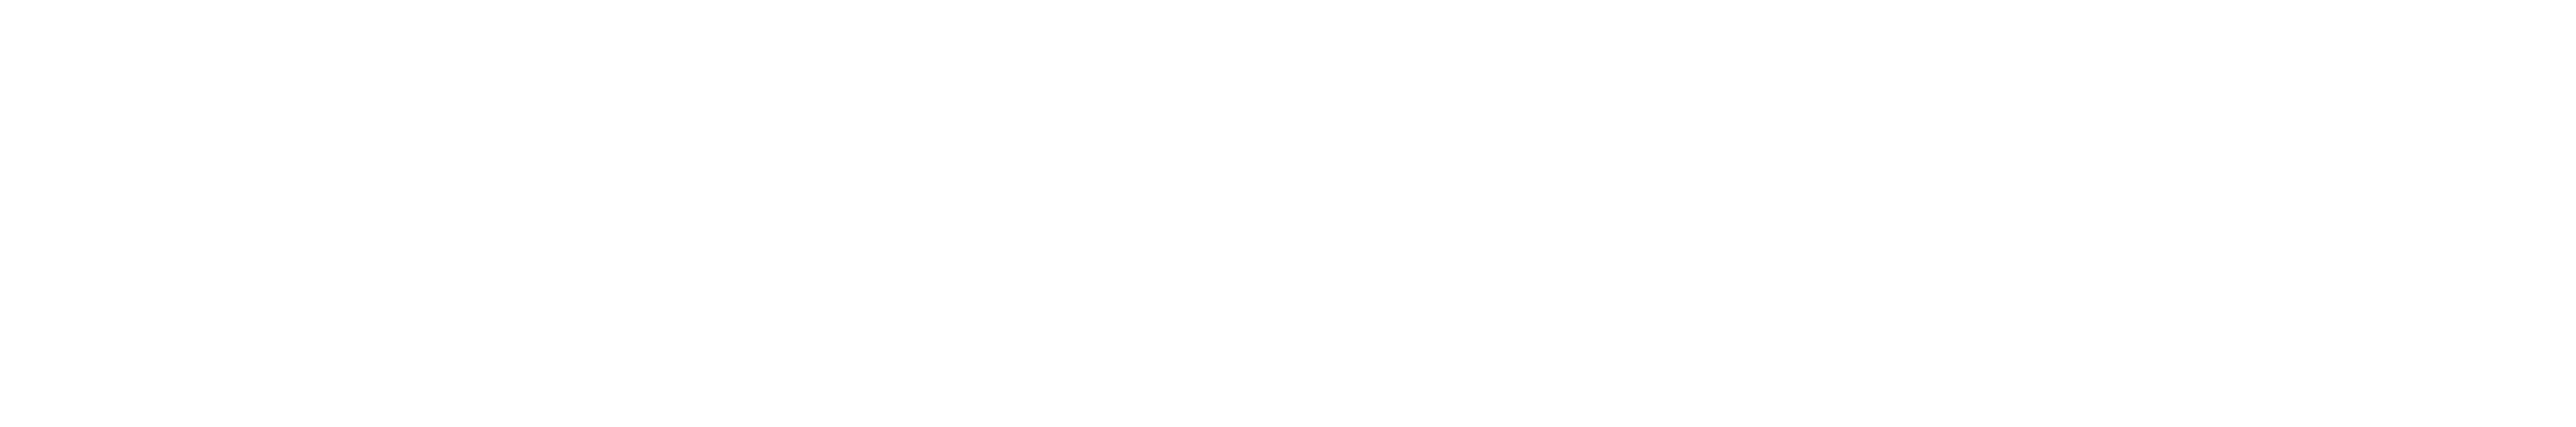 MOTOTRBO Nitro